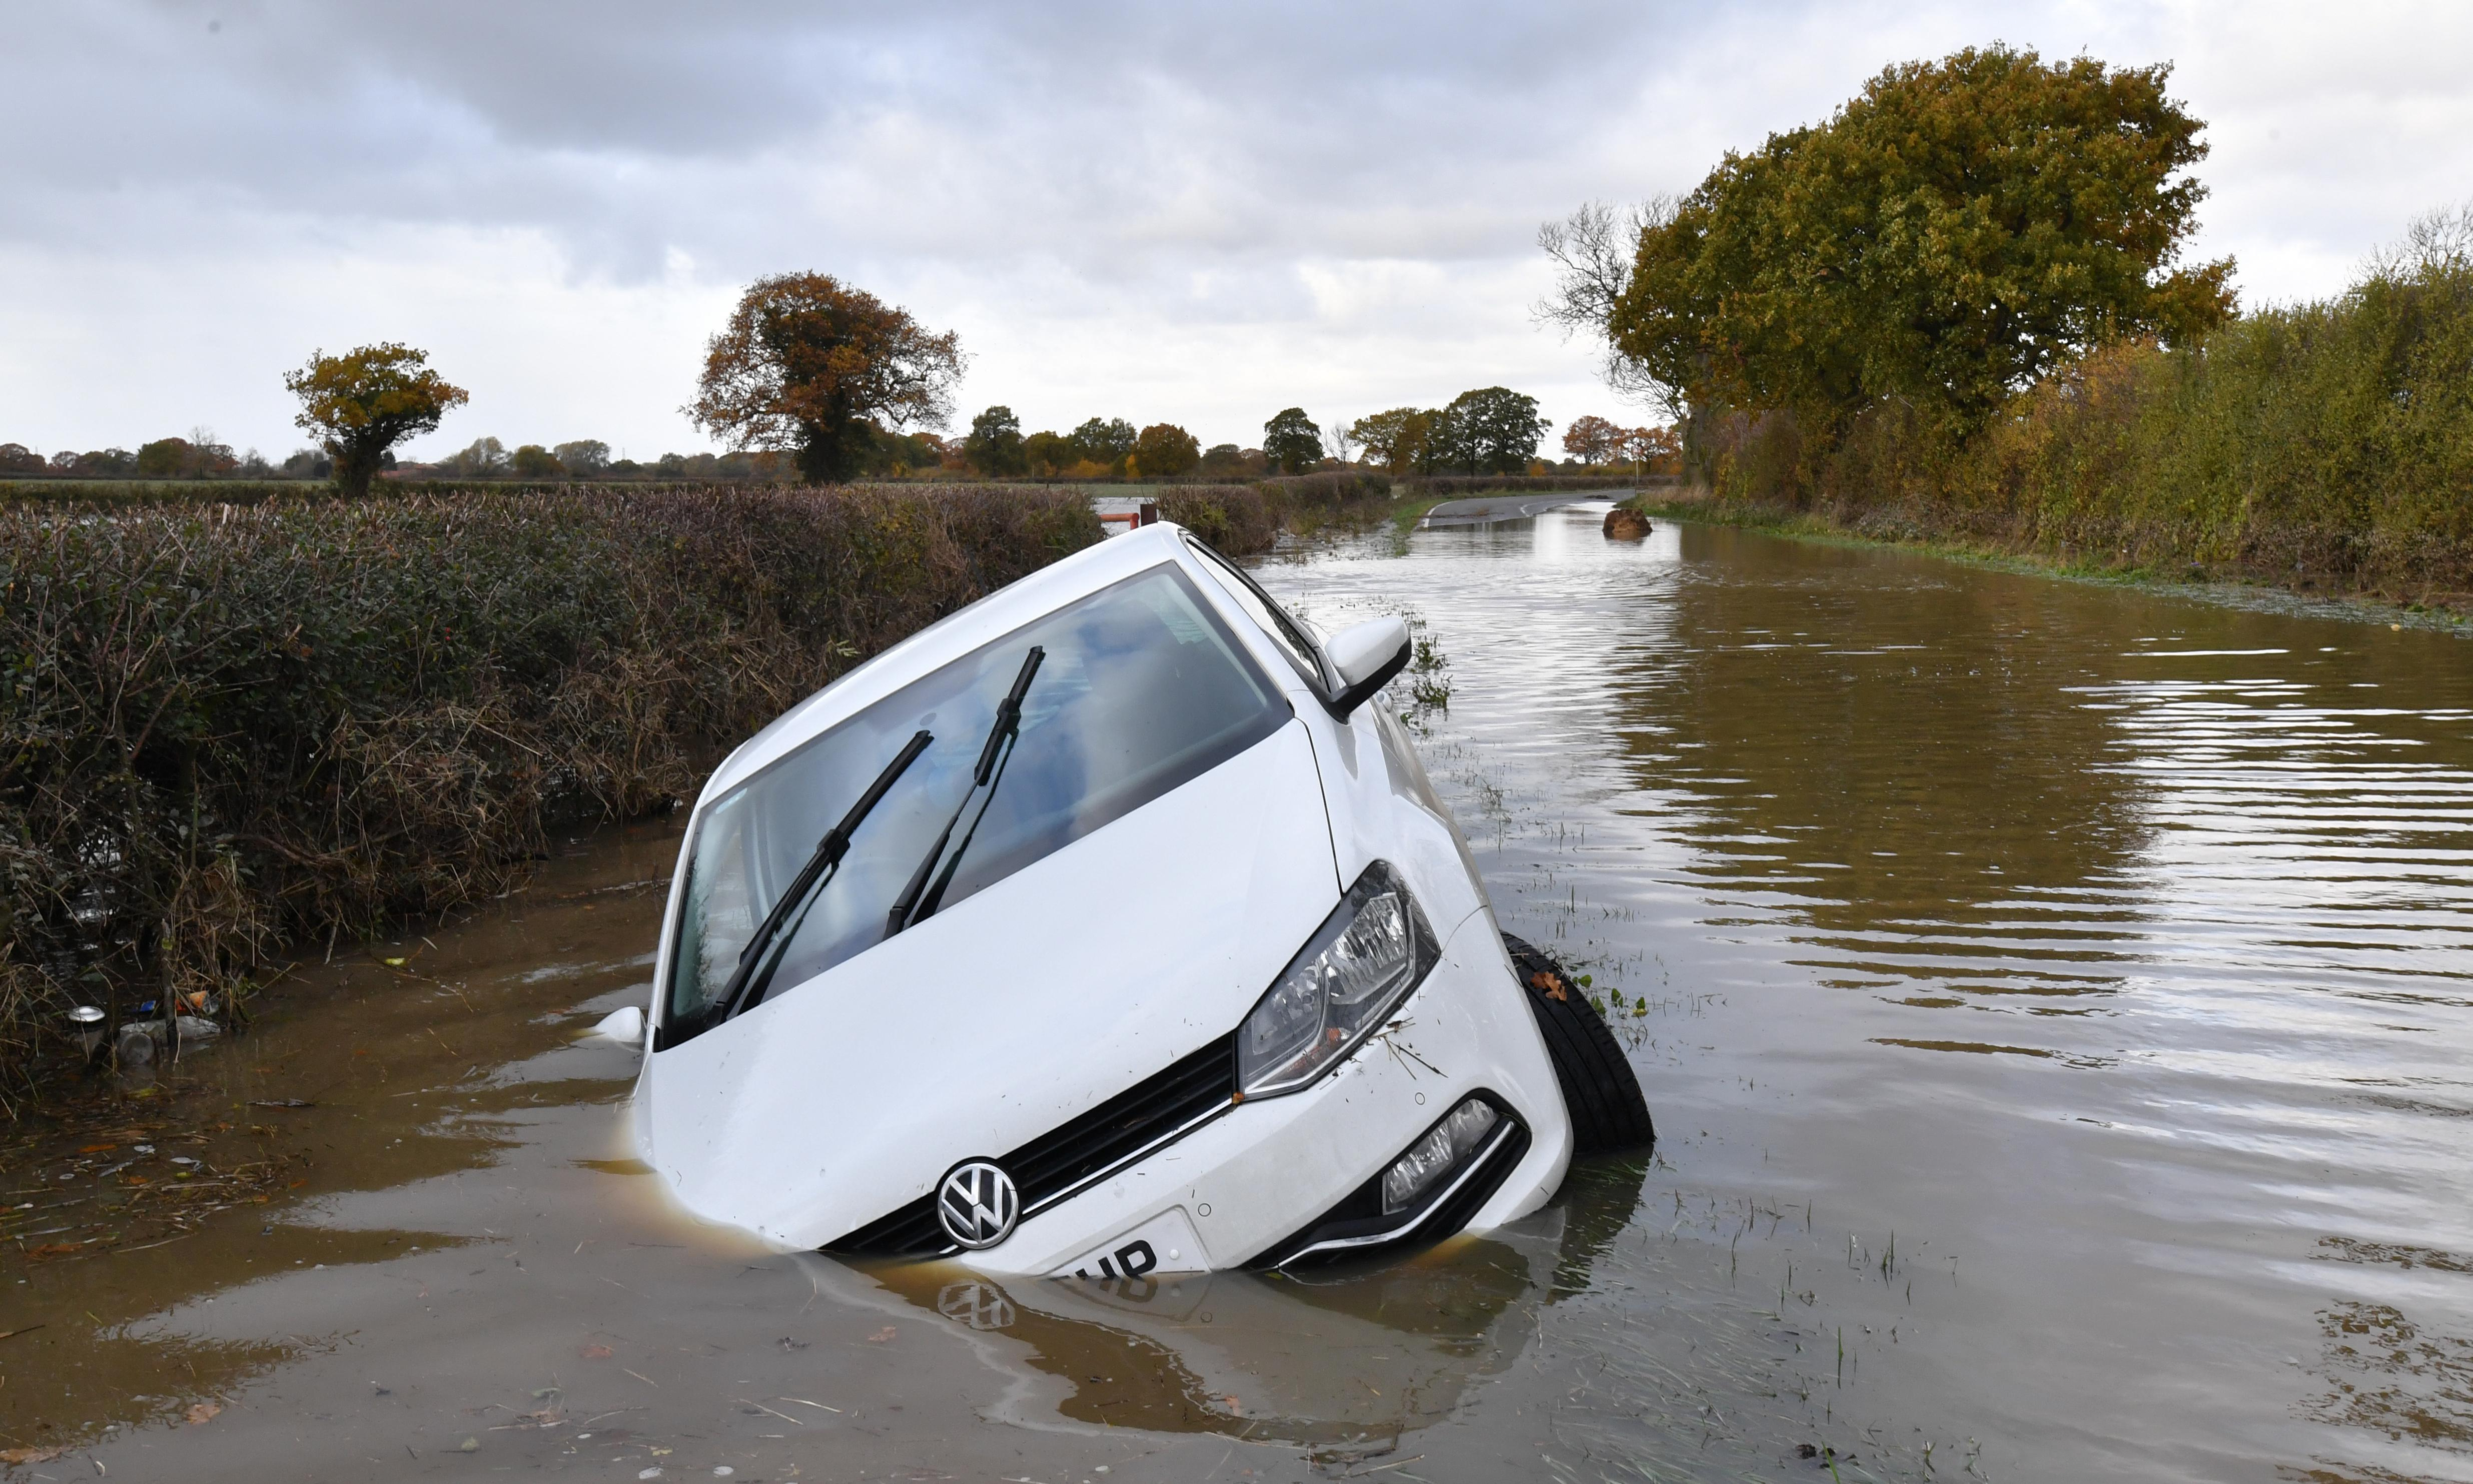 Boris Johnson to hold emergency Cobra meeting over floods